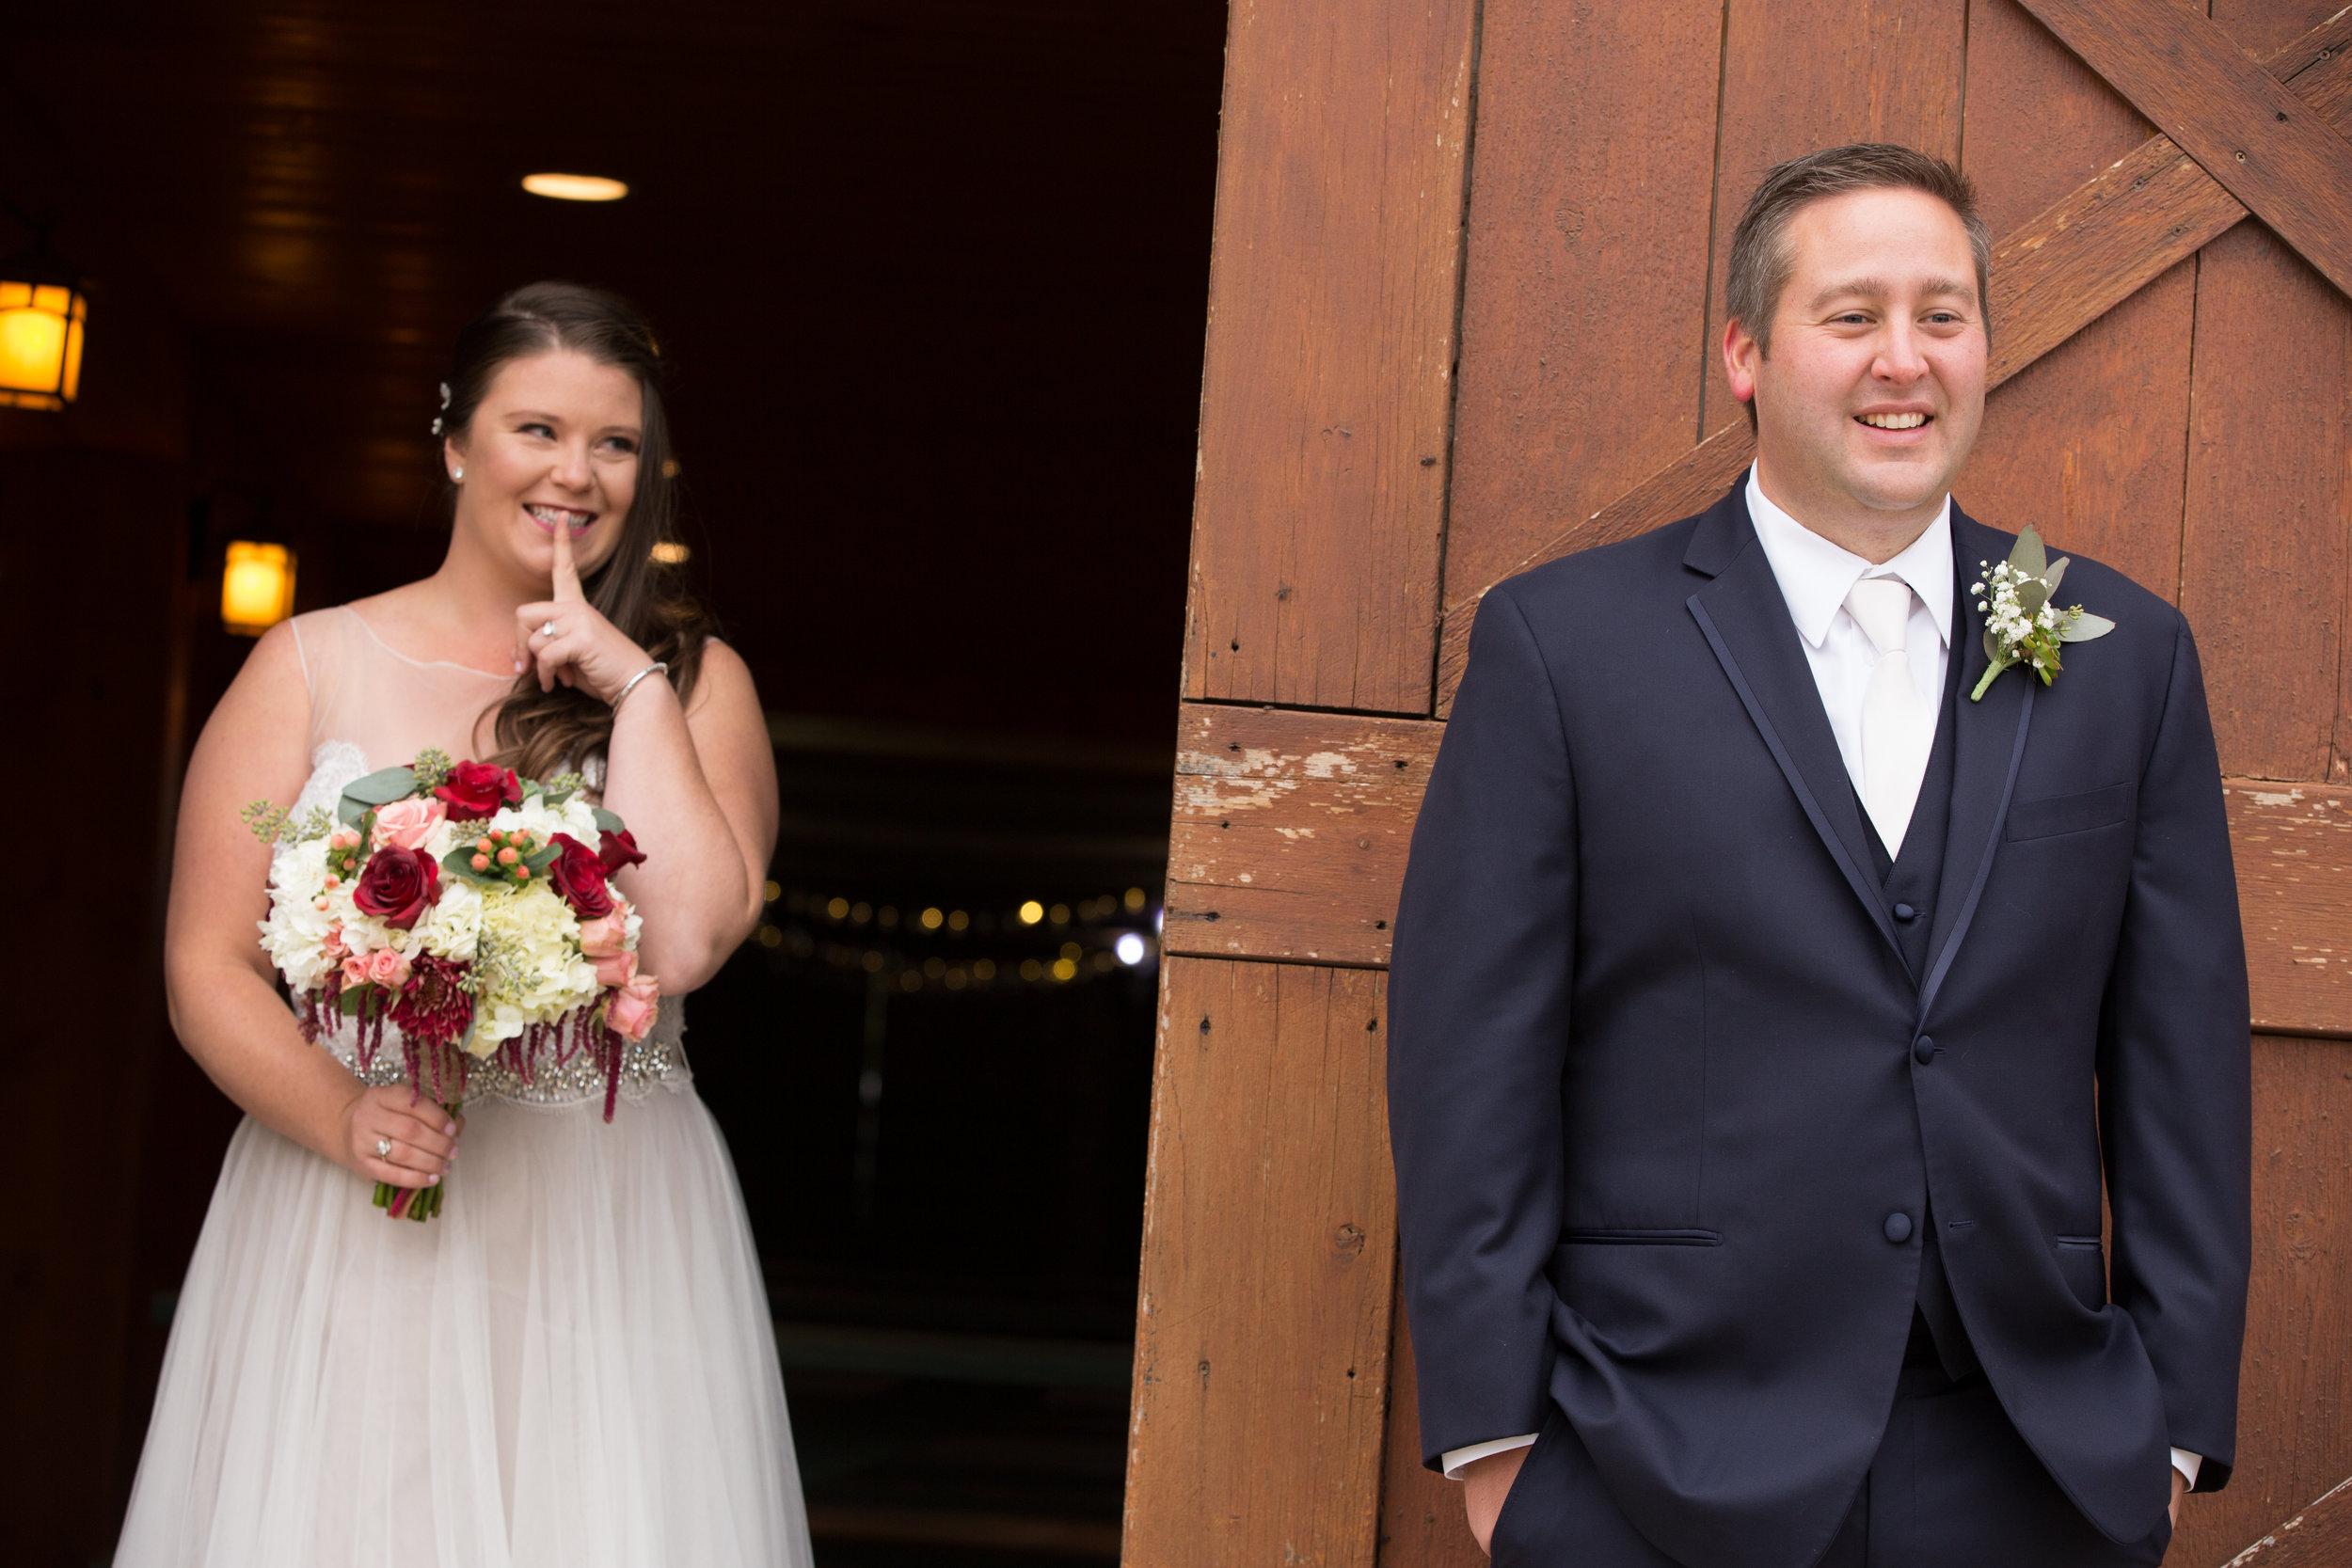 2017-10-28_Kathryn_Ryan_Wedding-6.JPG